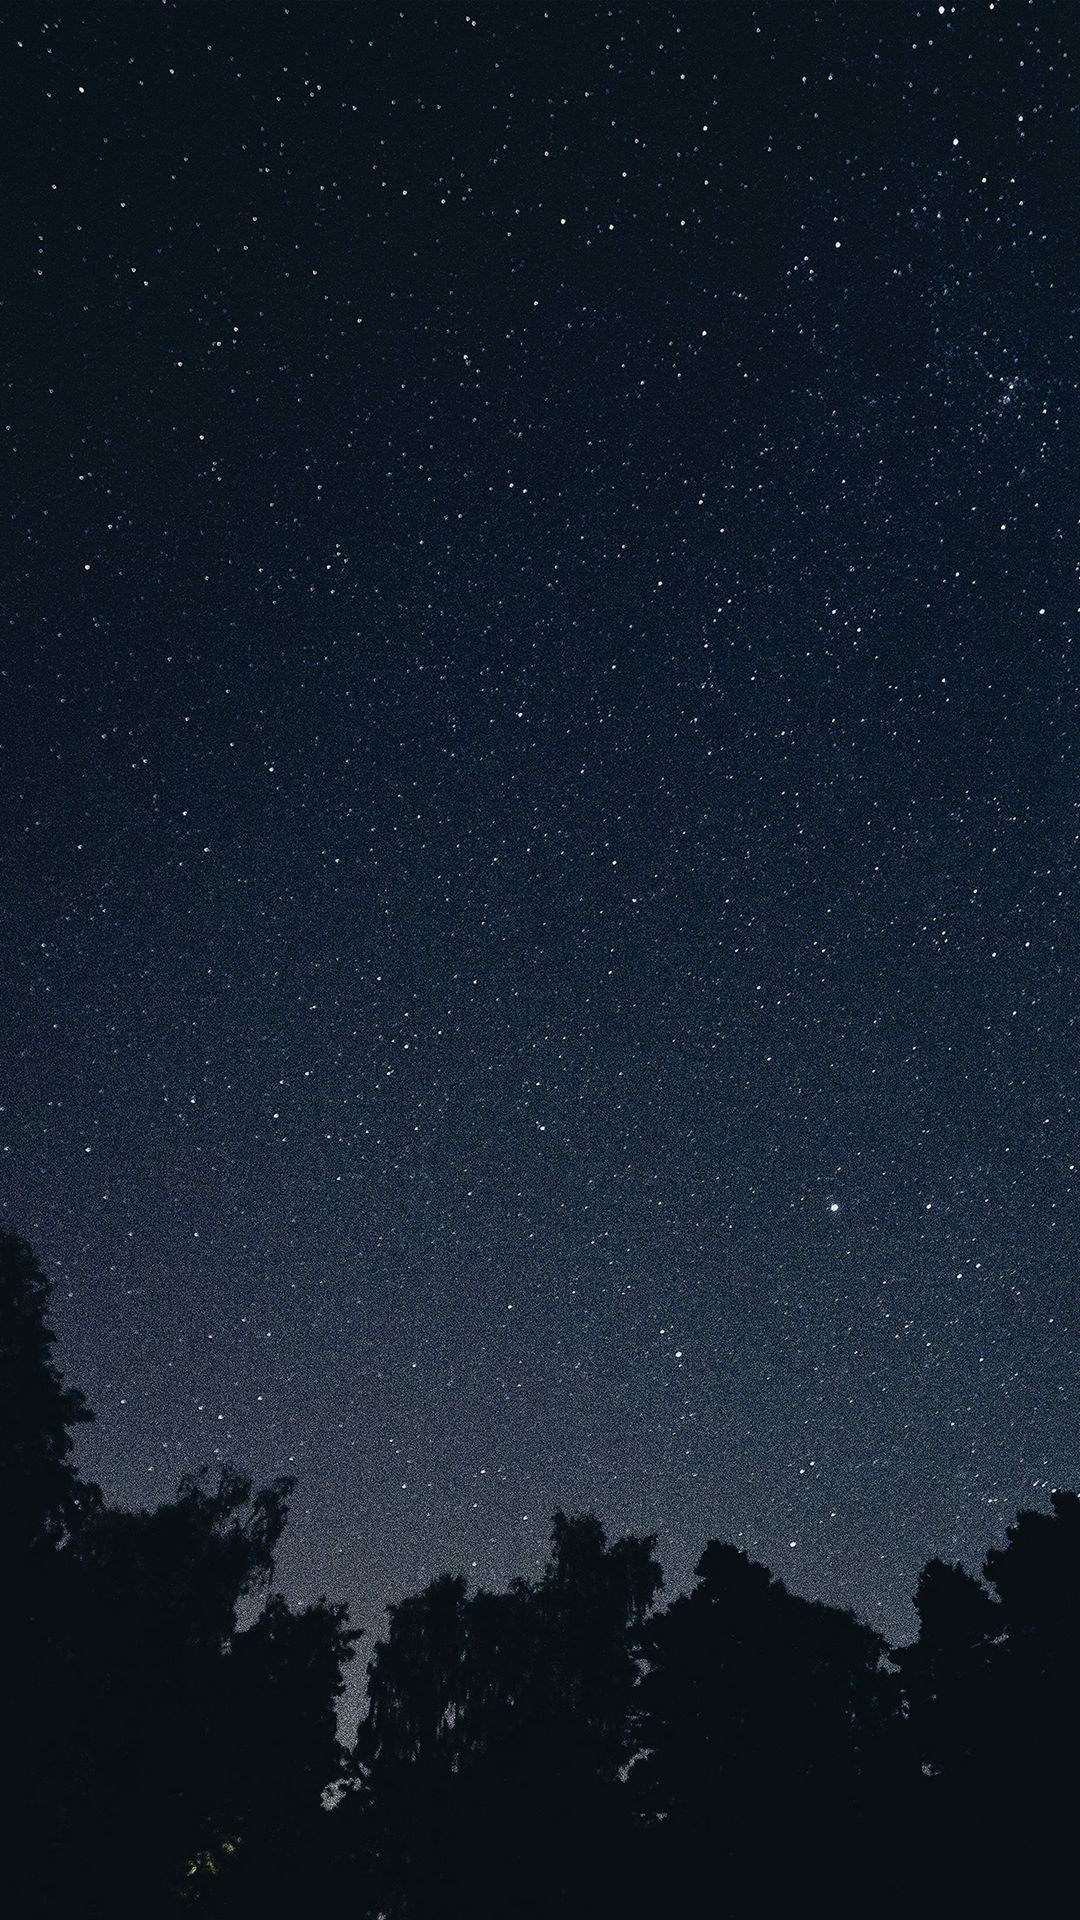 Night Sky Phone Wallpaper (75+ images)